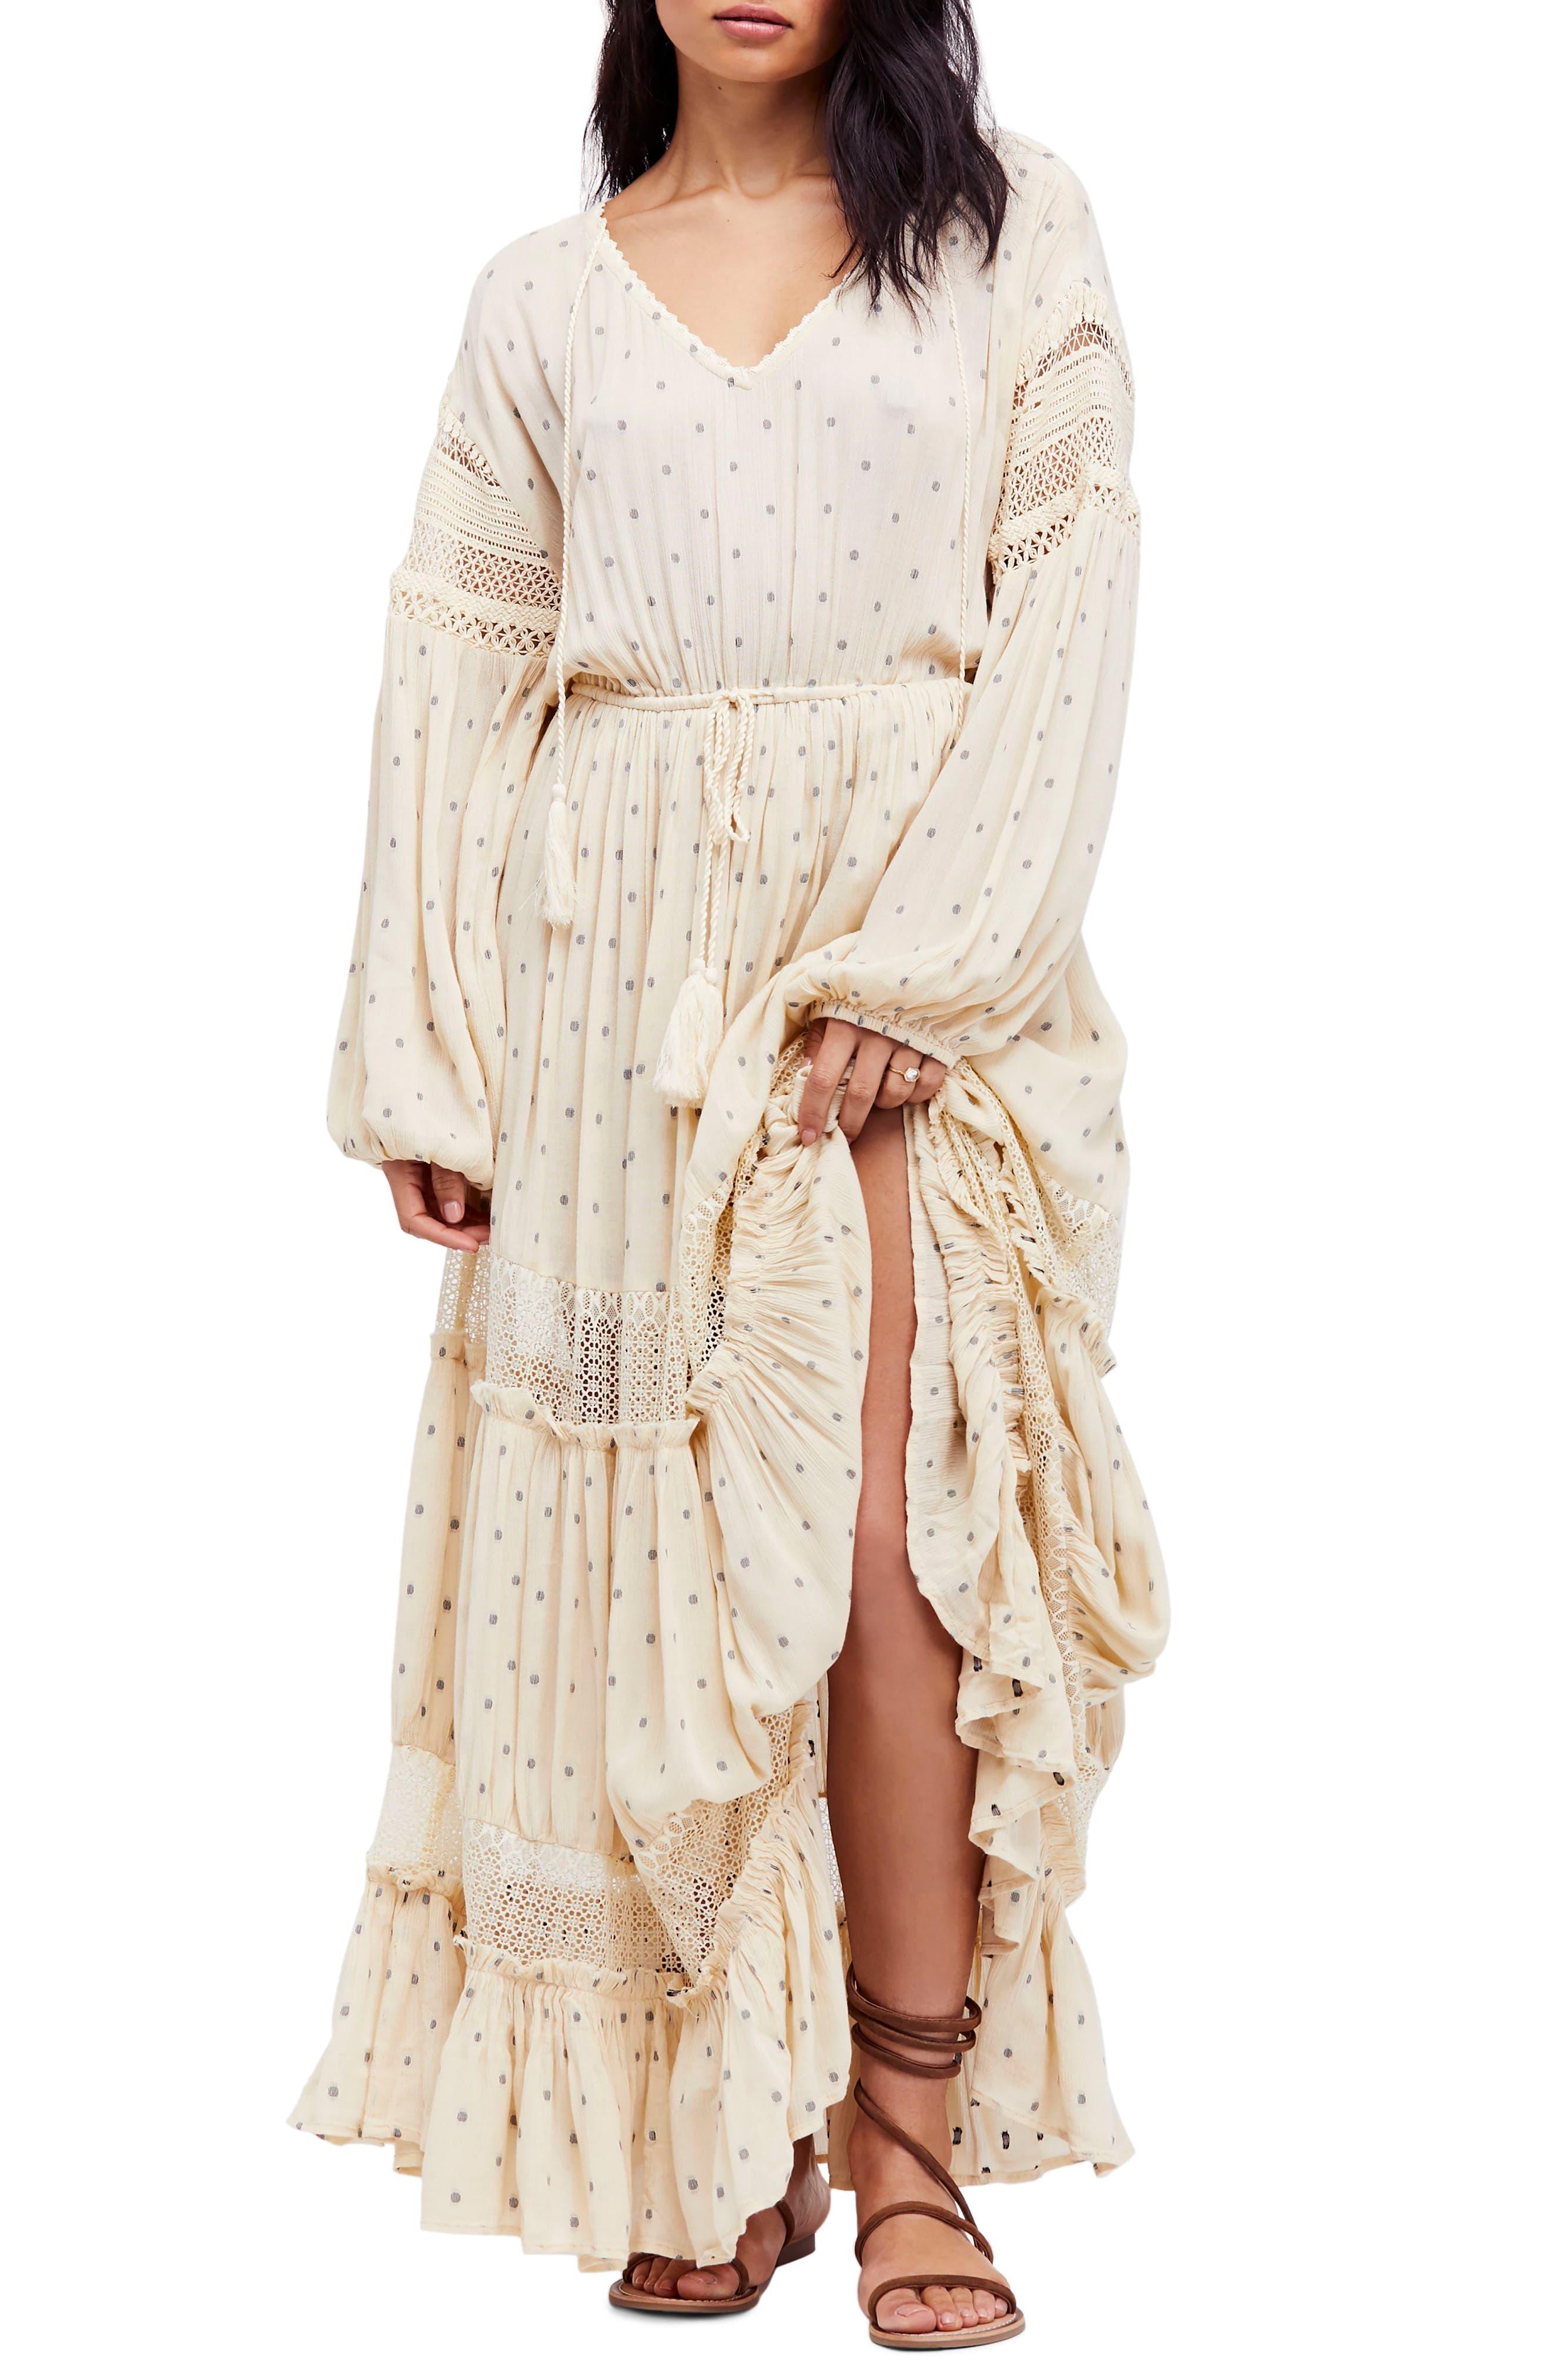 Sada Maxi Dress,                             Alternate thumbnail 5, color,                             903